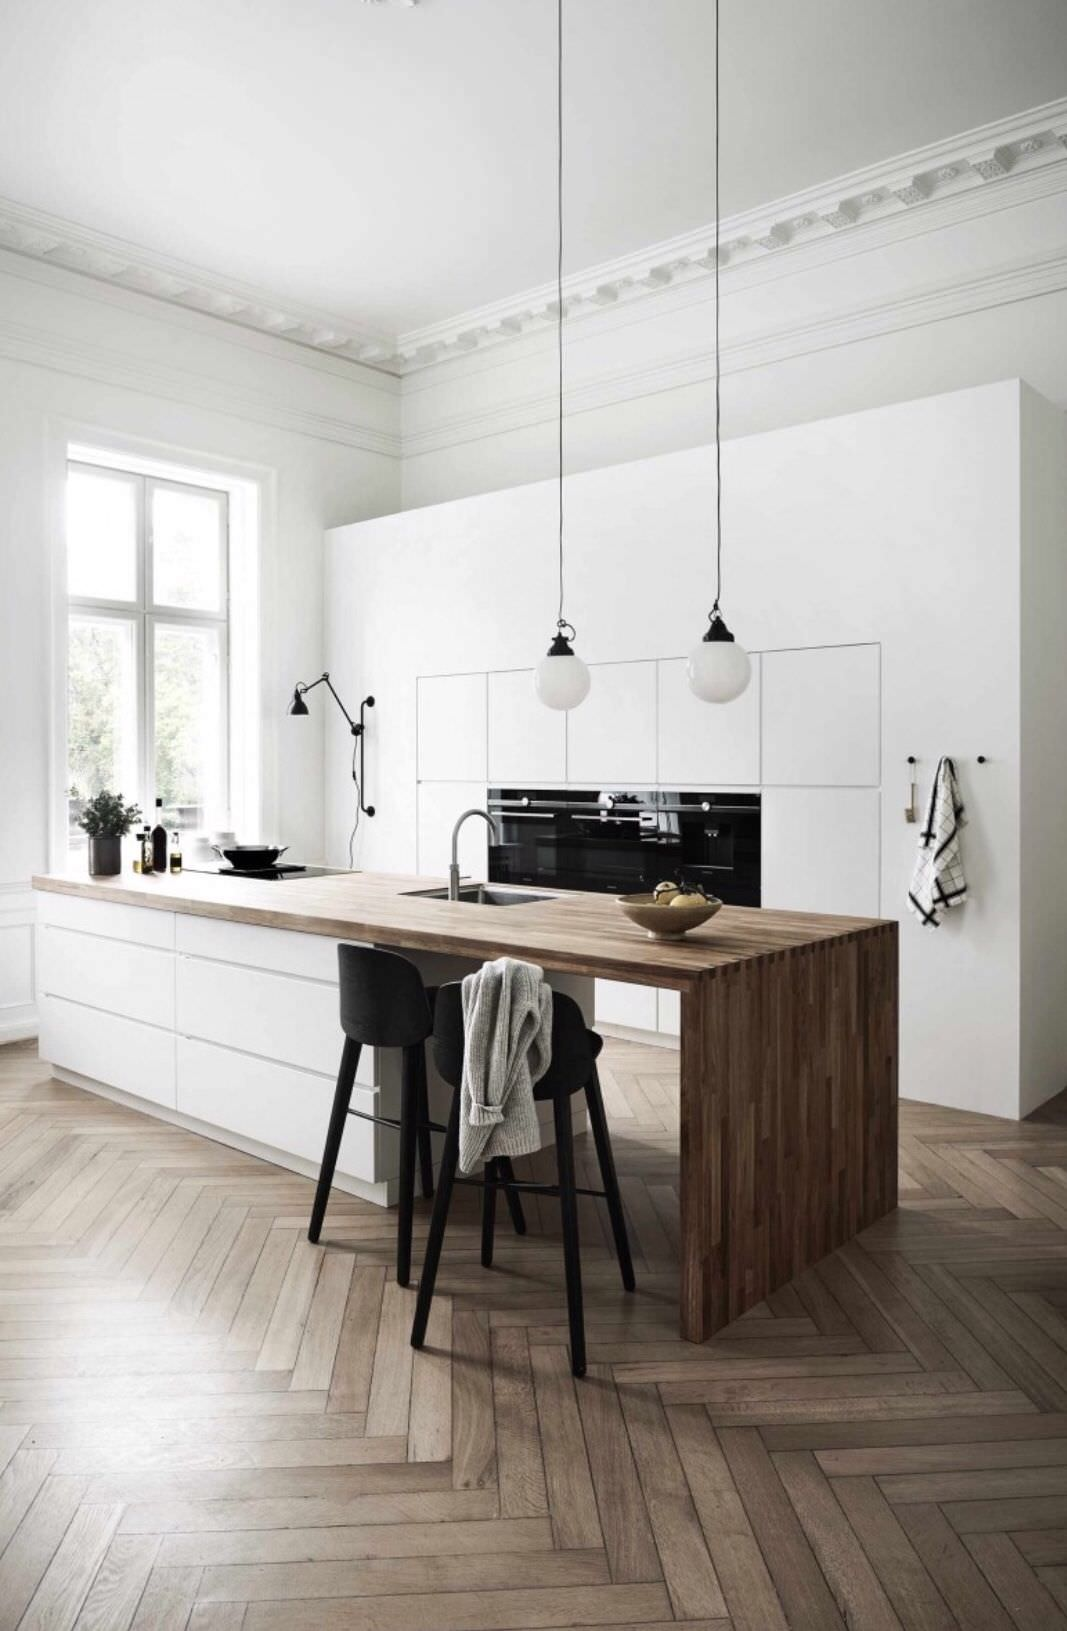 Moderne Cucine Da 100 Sogno Idee kOPXZTwiul